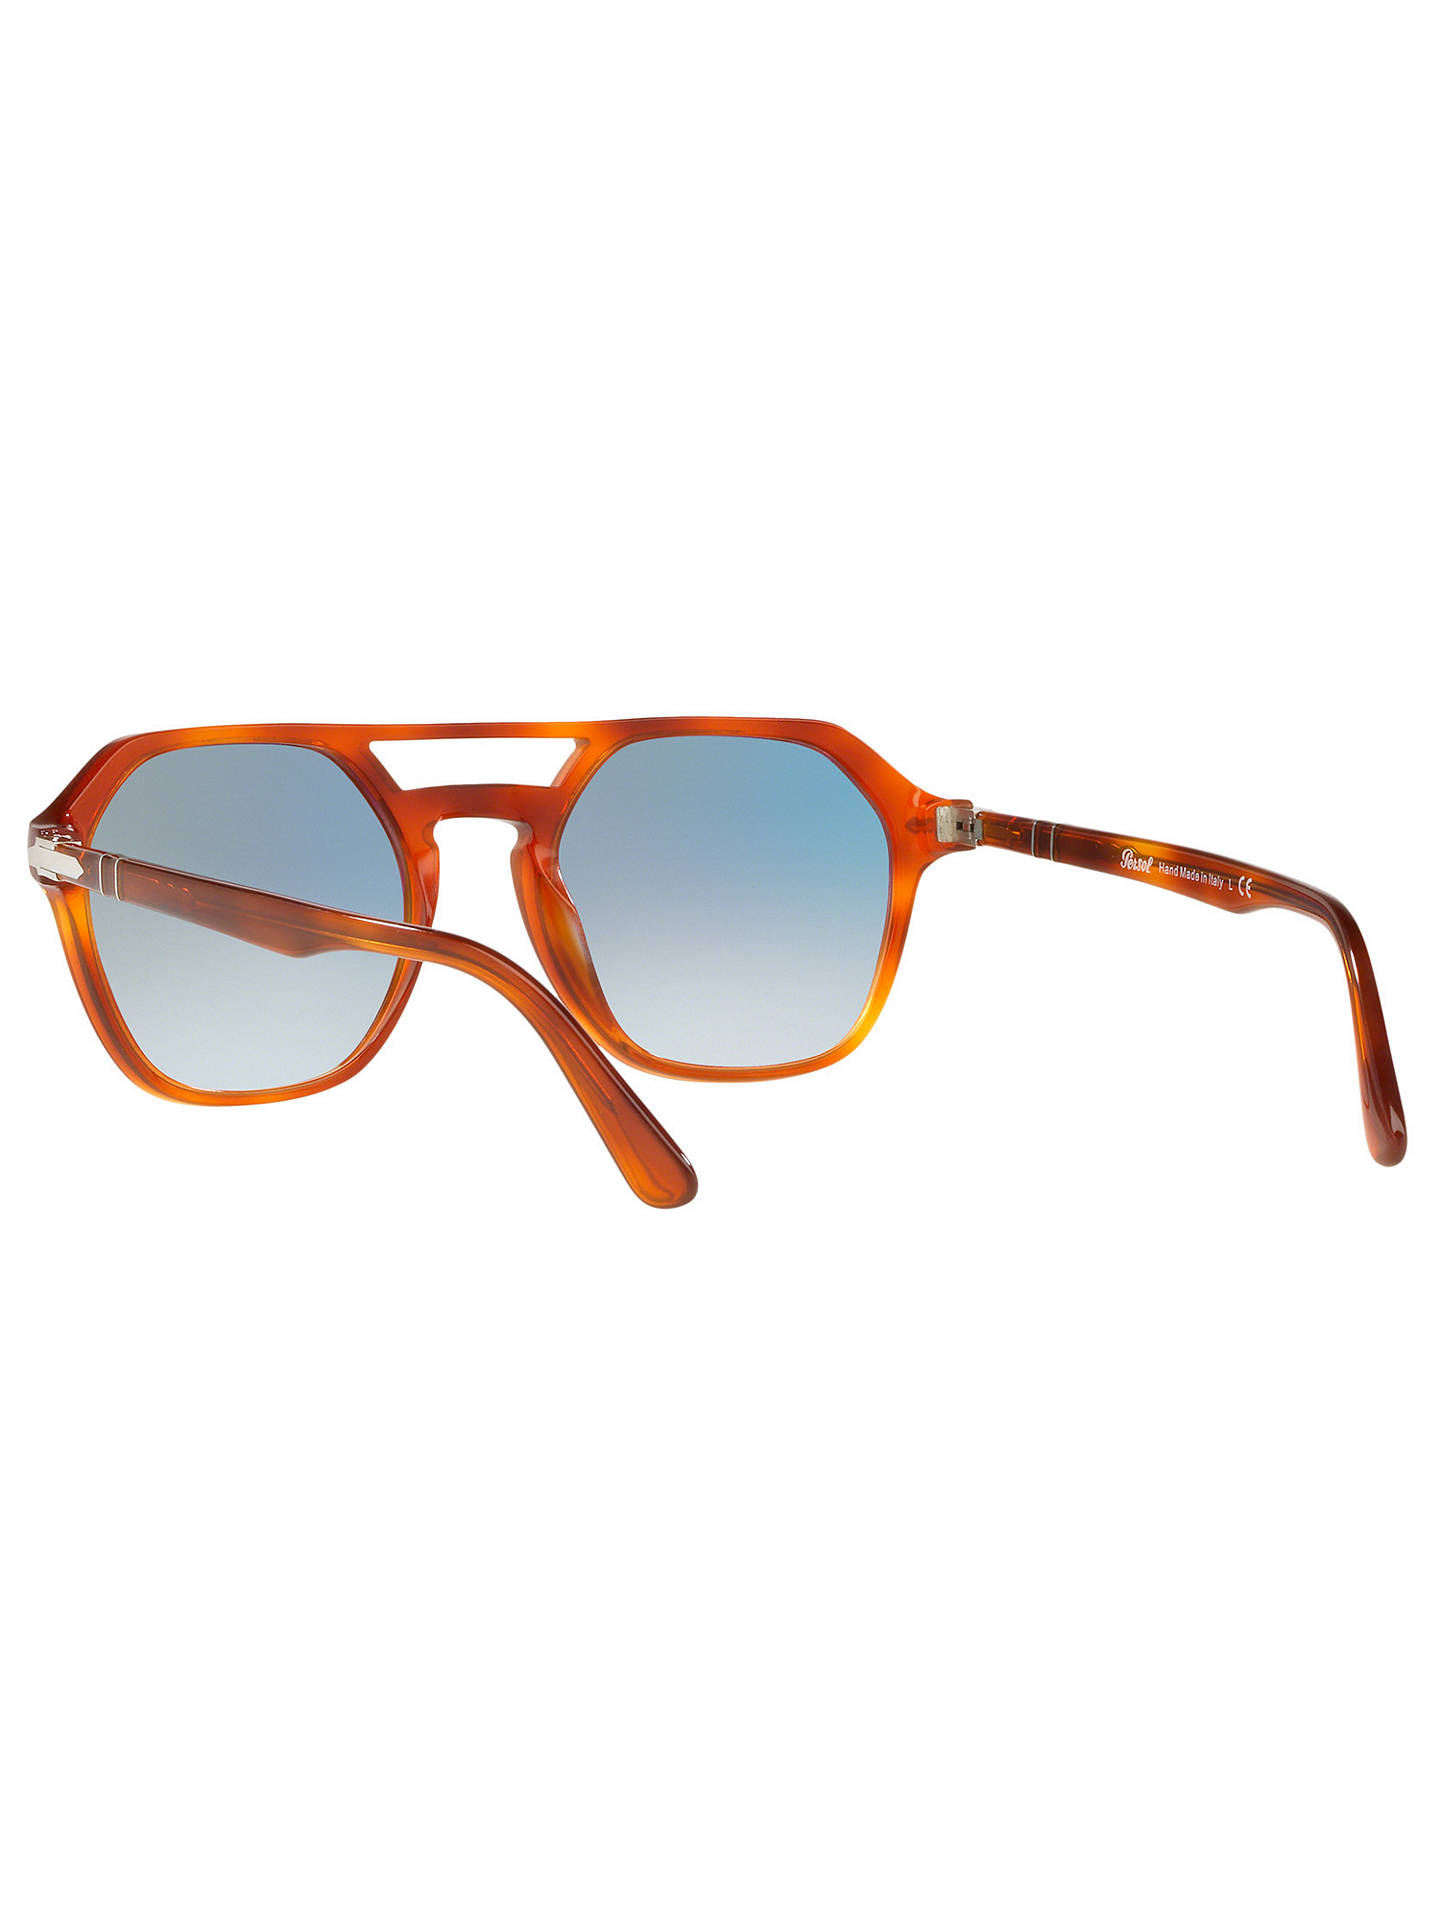 df51dc7ba8941 ... Buy Persol PO3194S Men s Geometric Sunglasses